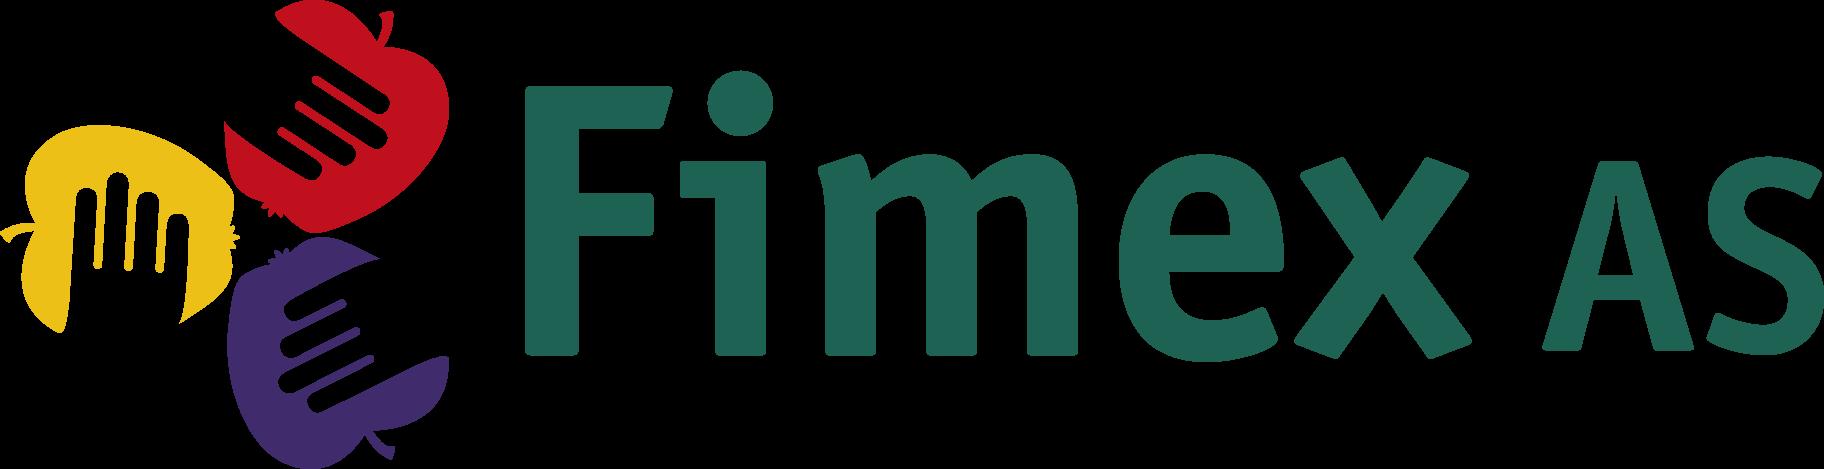 Fimex logo